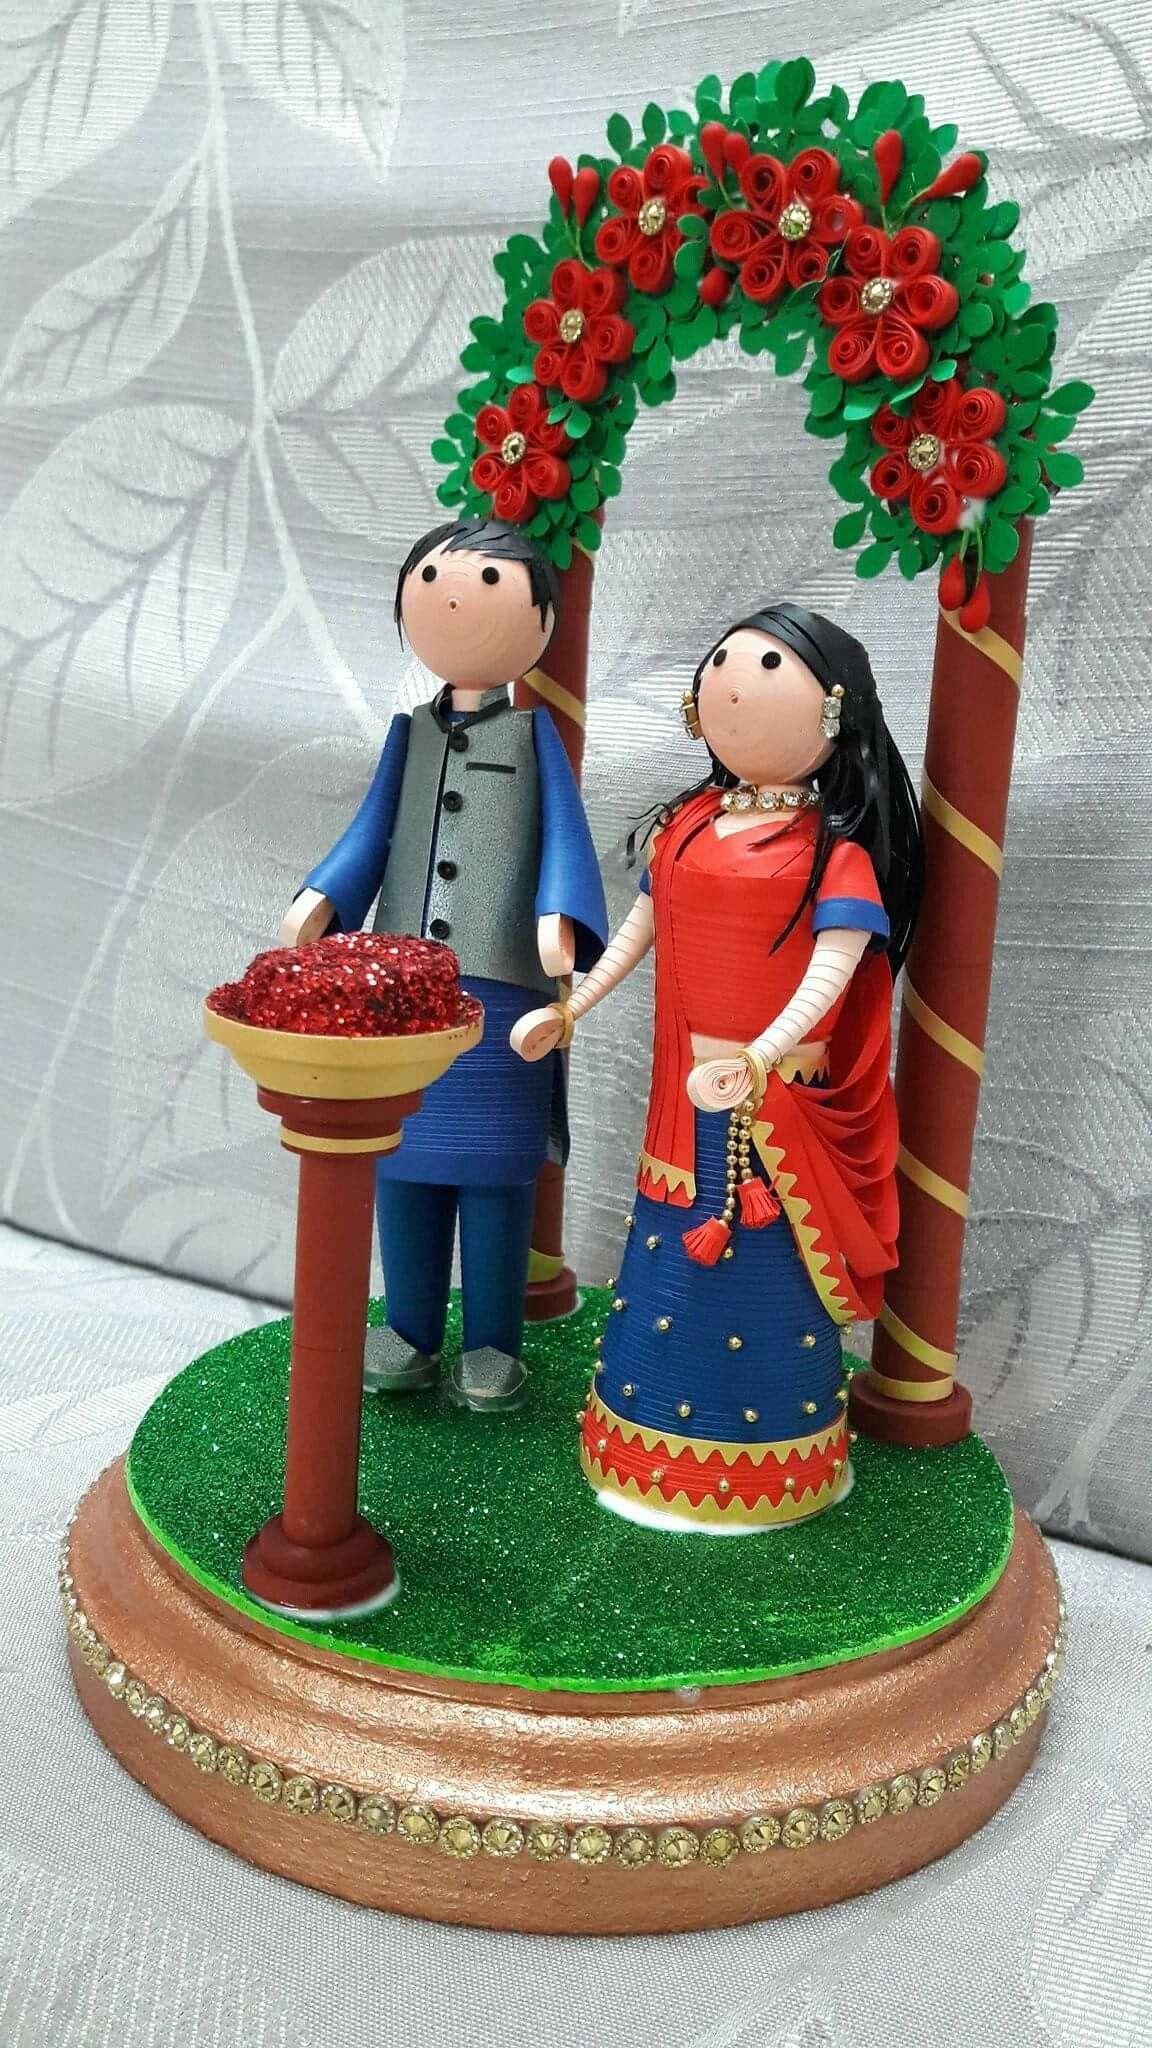 Quilling wedding decorations  Pin by Ana Maria Mendez rodriguez on archivos de álbum  Pinterest